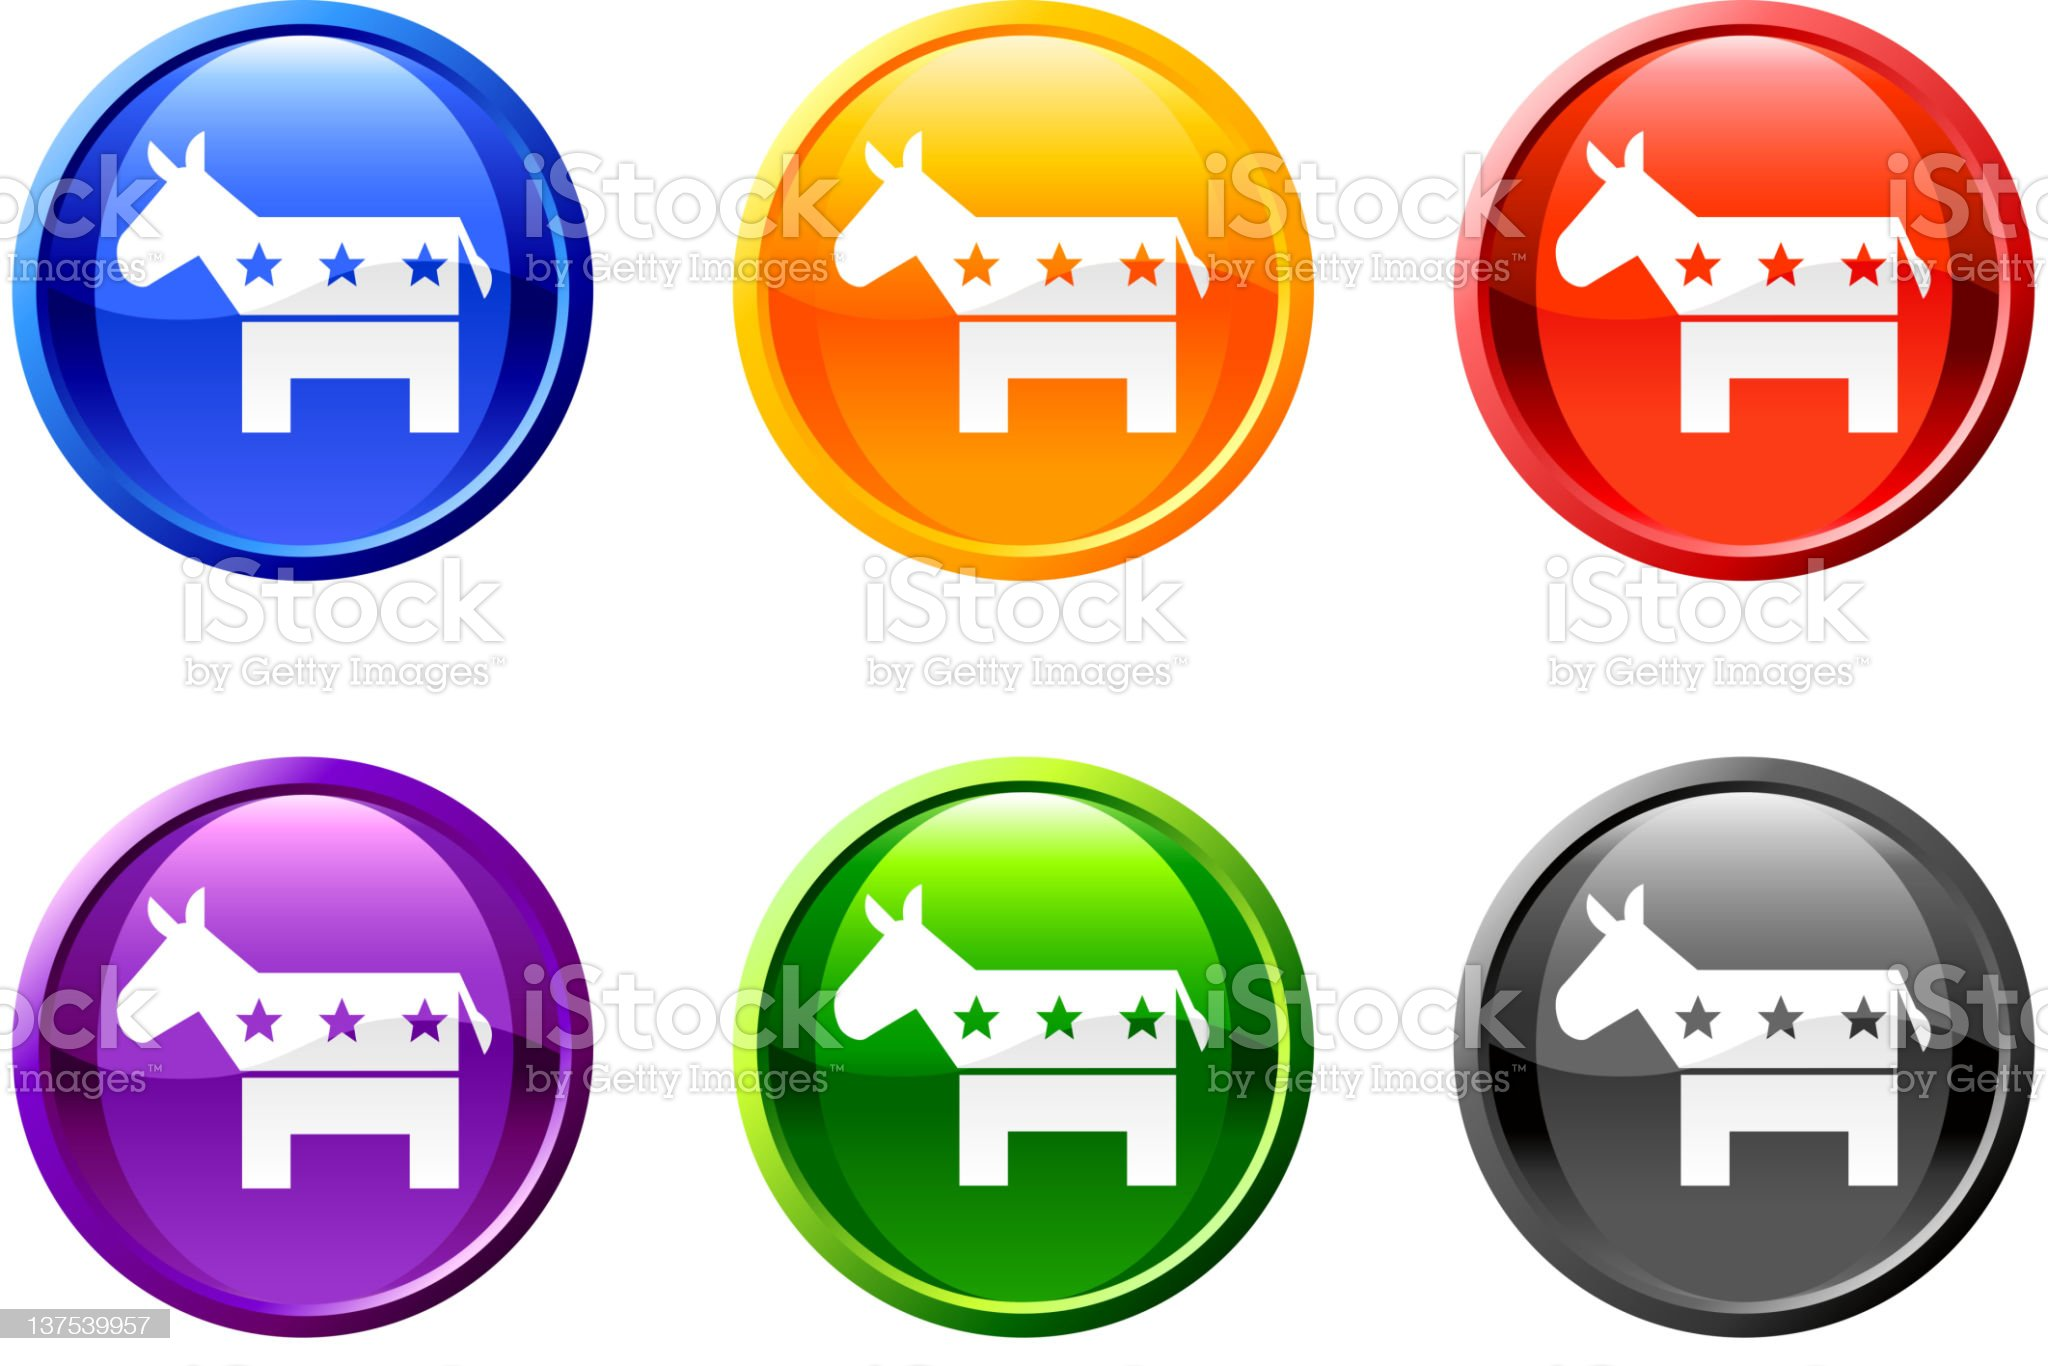 Democrat donkey button royalty free vector art royalty-free stock vector art